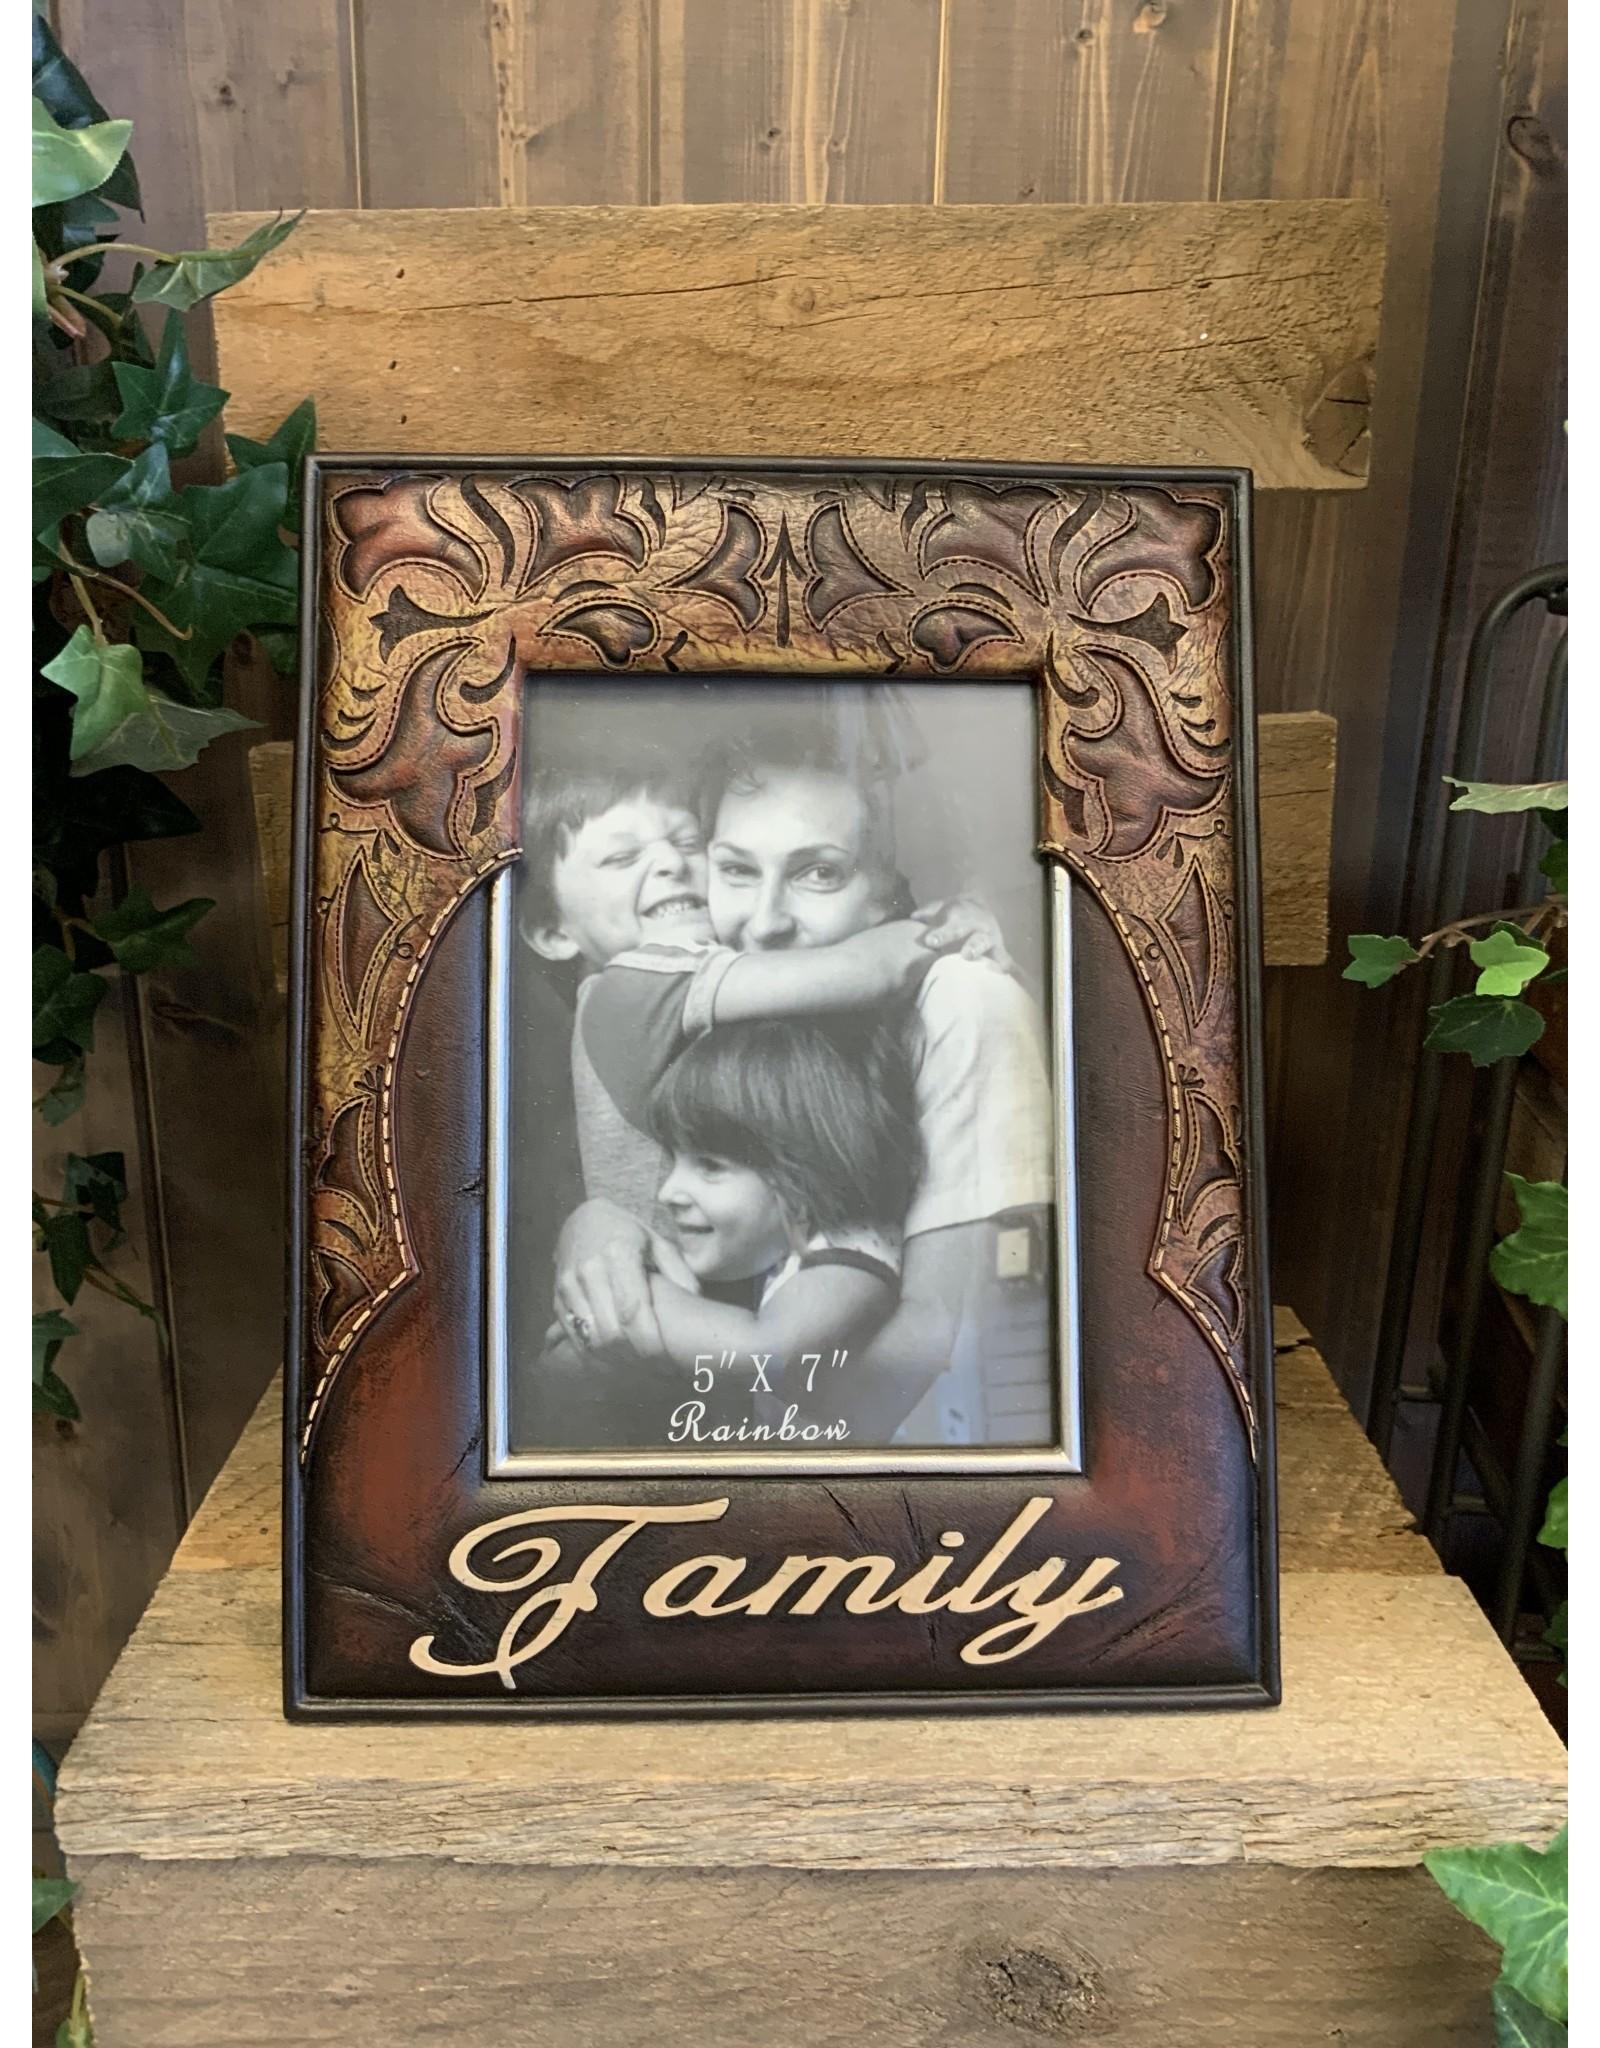 RAINBOW FAMILY LEATHER